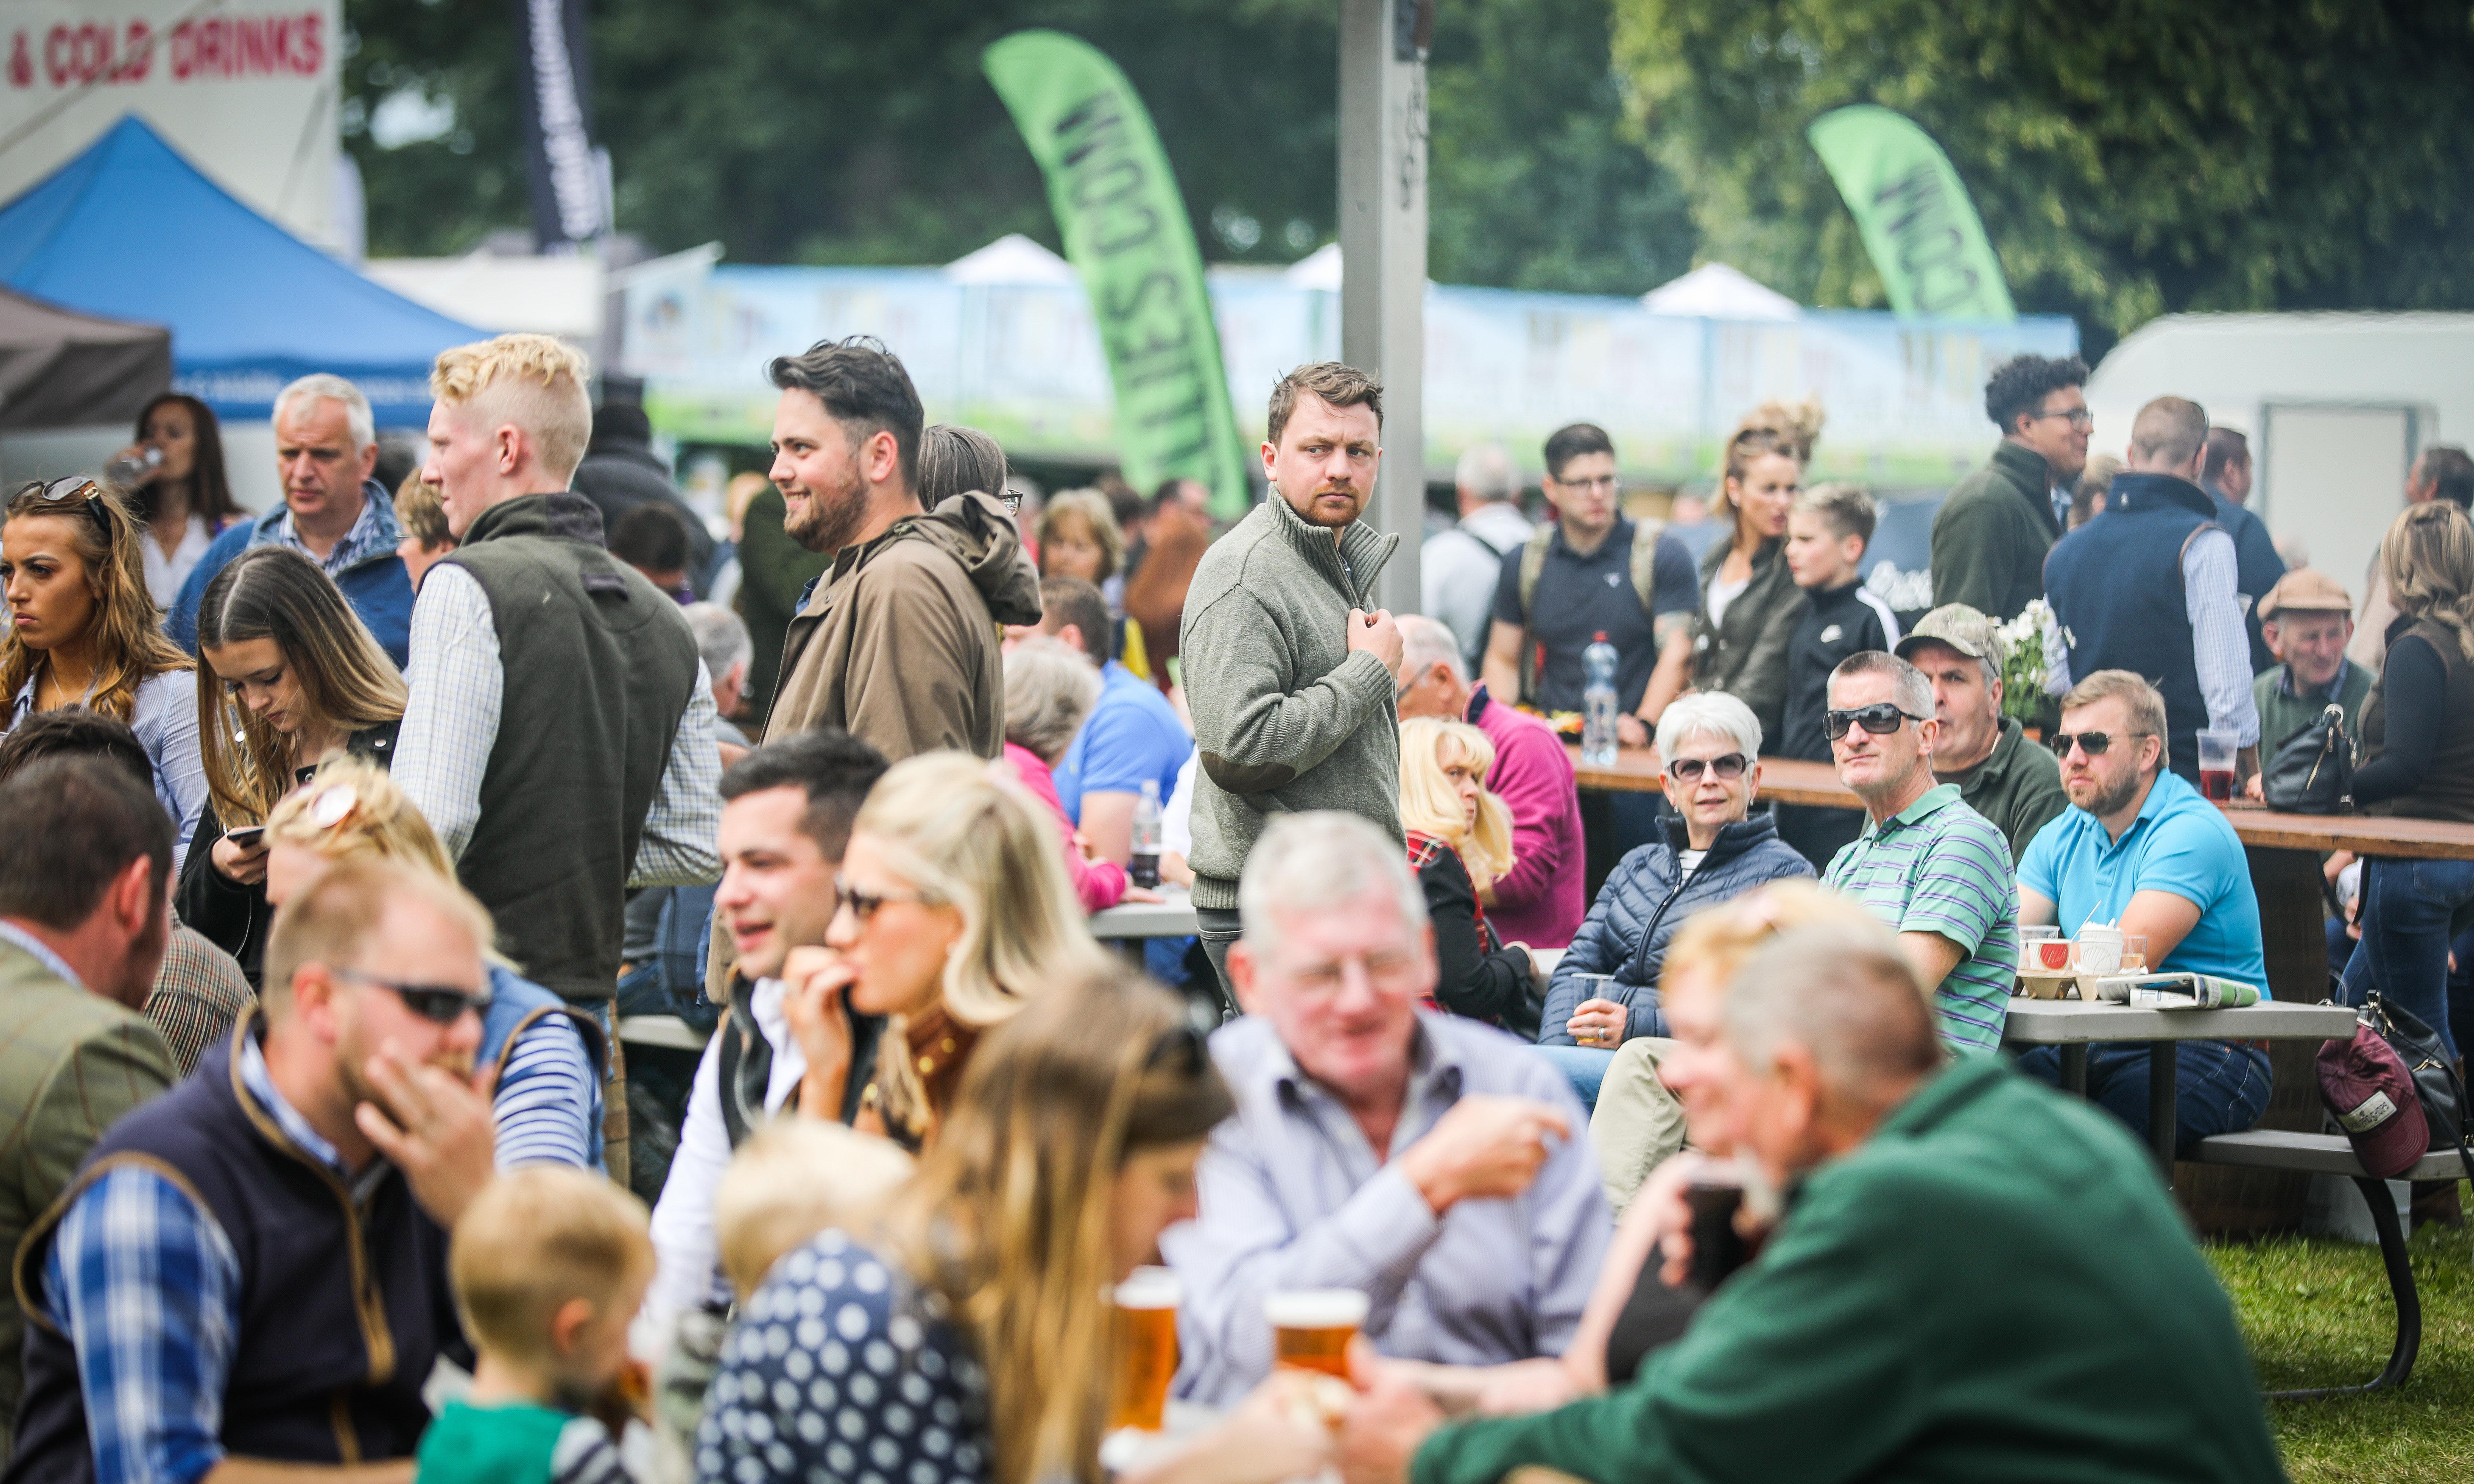 Crowds enjoying refreshments at the Scottish Game Fair at Scone Palace.